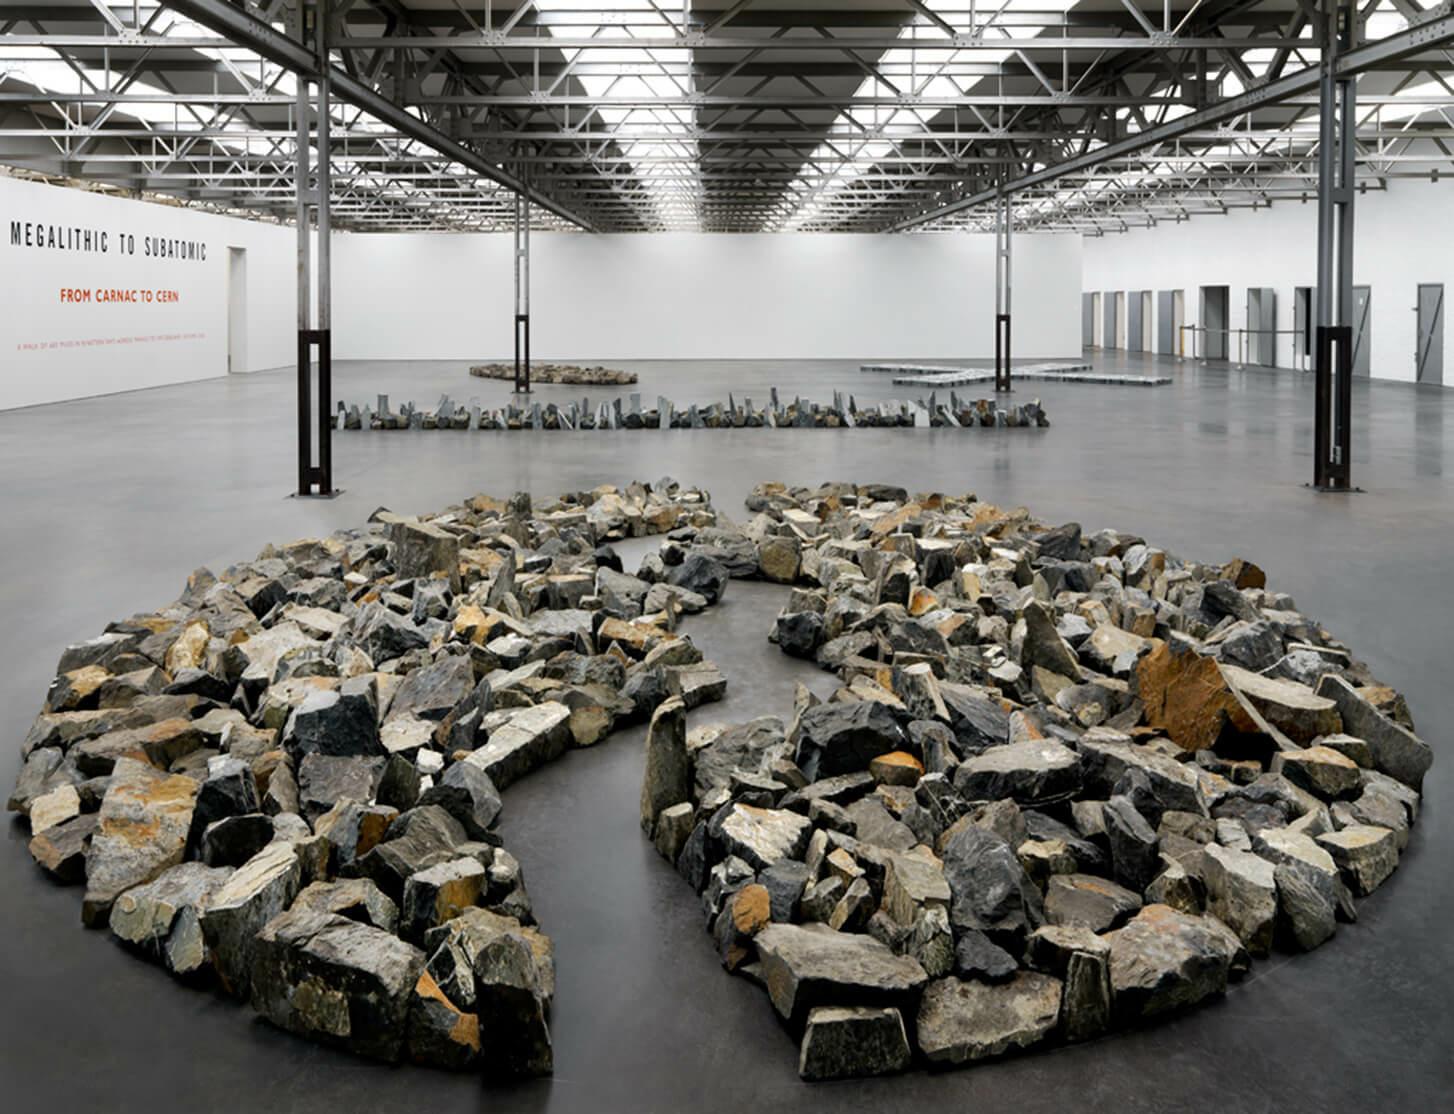 De Pont Museum in Tilburg opens major exhibition by Richard Long